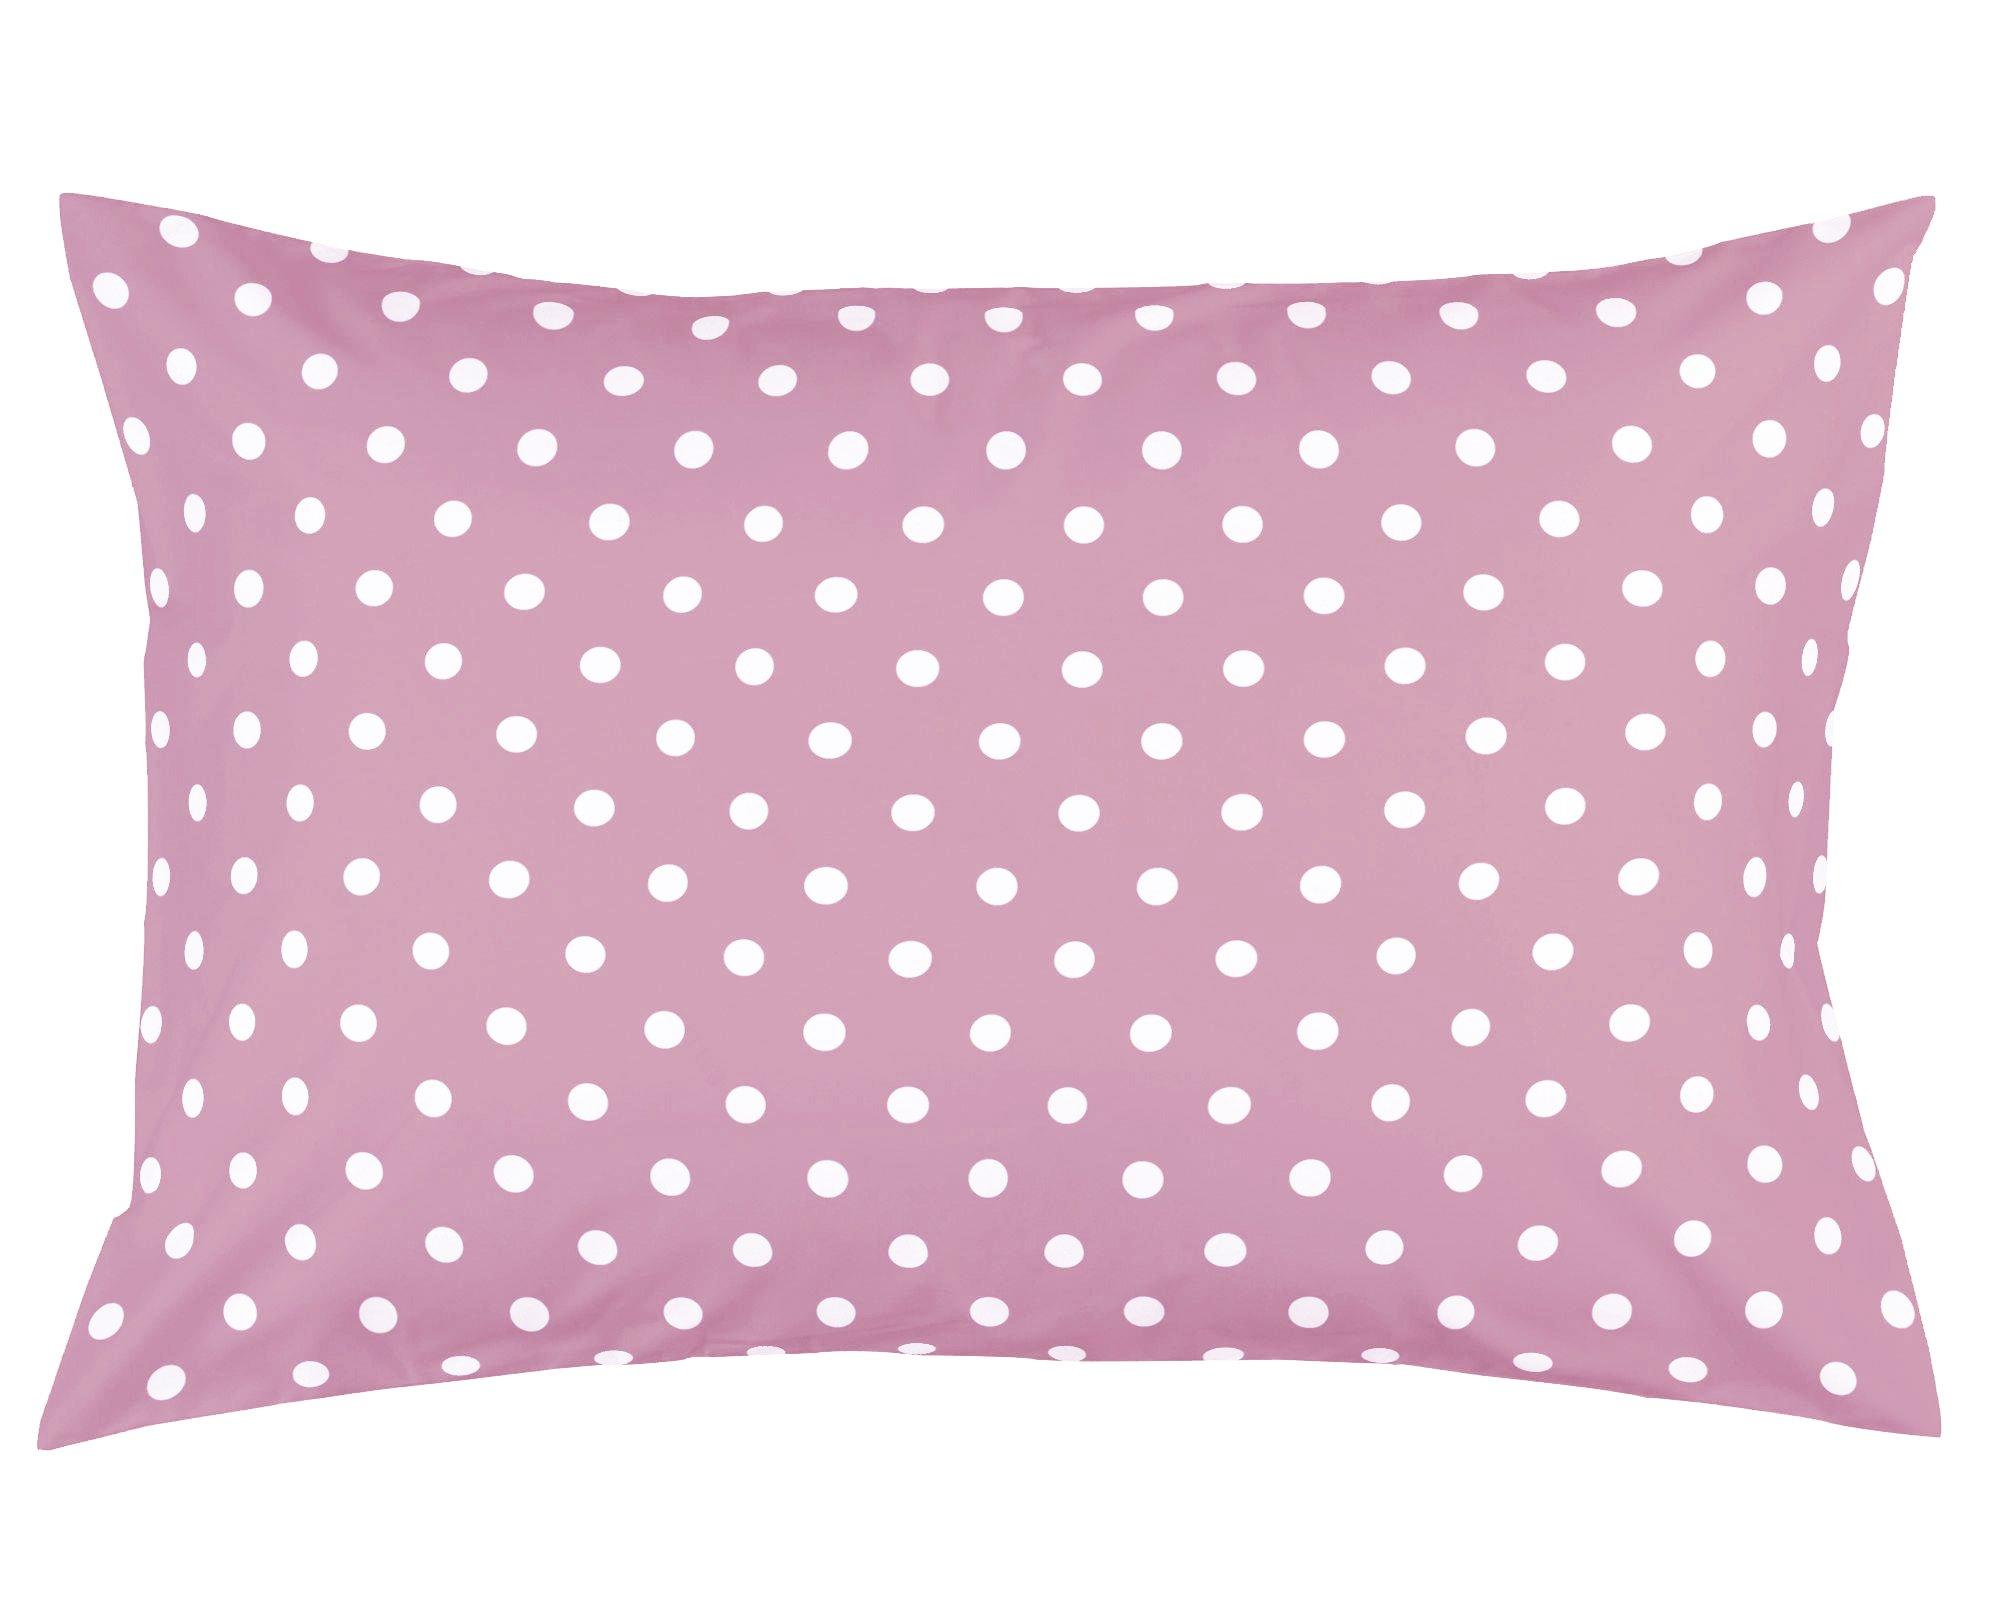 Toddler Pillowcase by Dreamtown Kids. 100% Cotton. Pink Polka DOTS